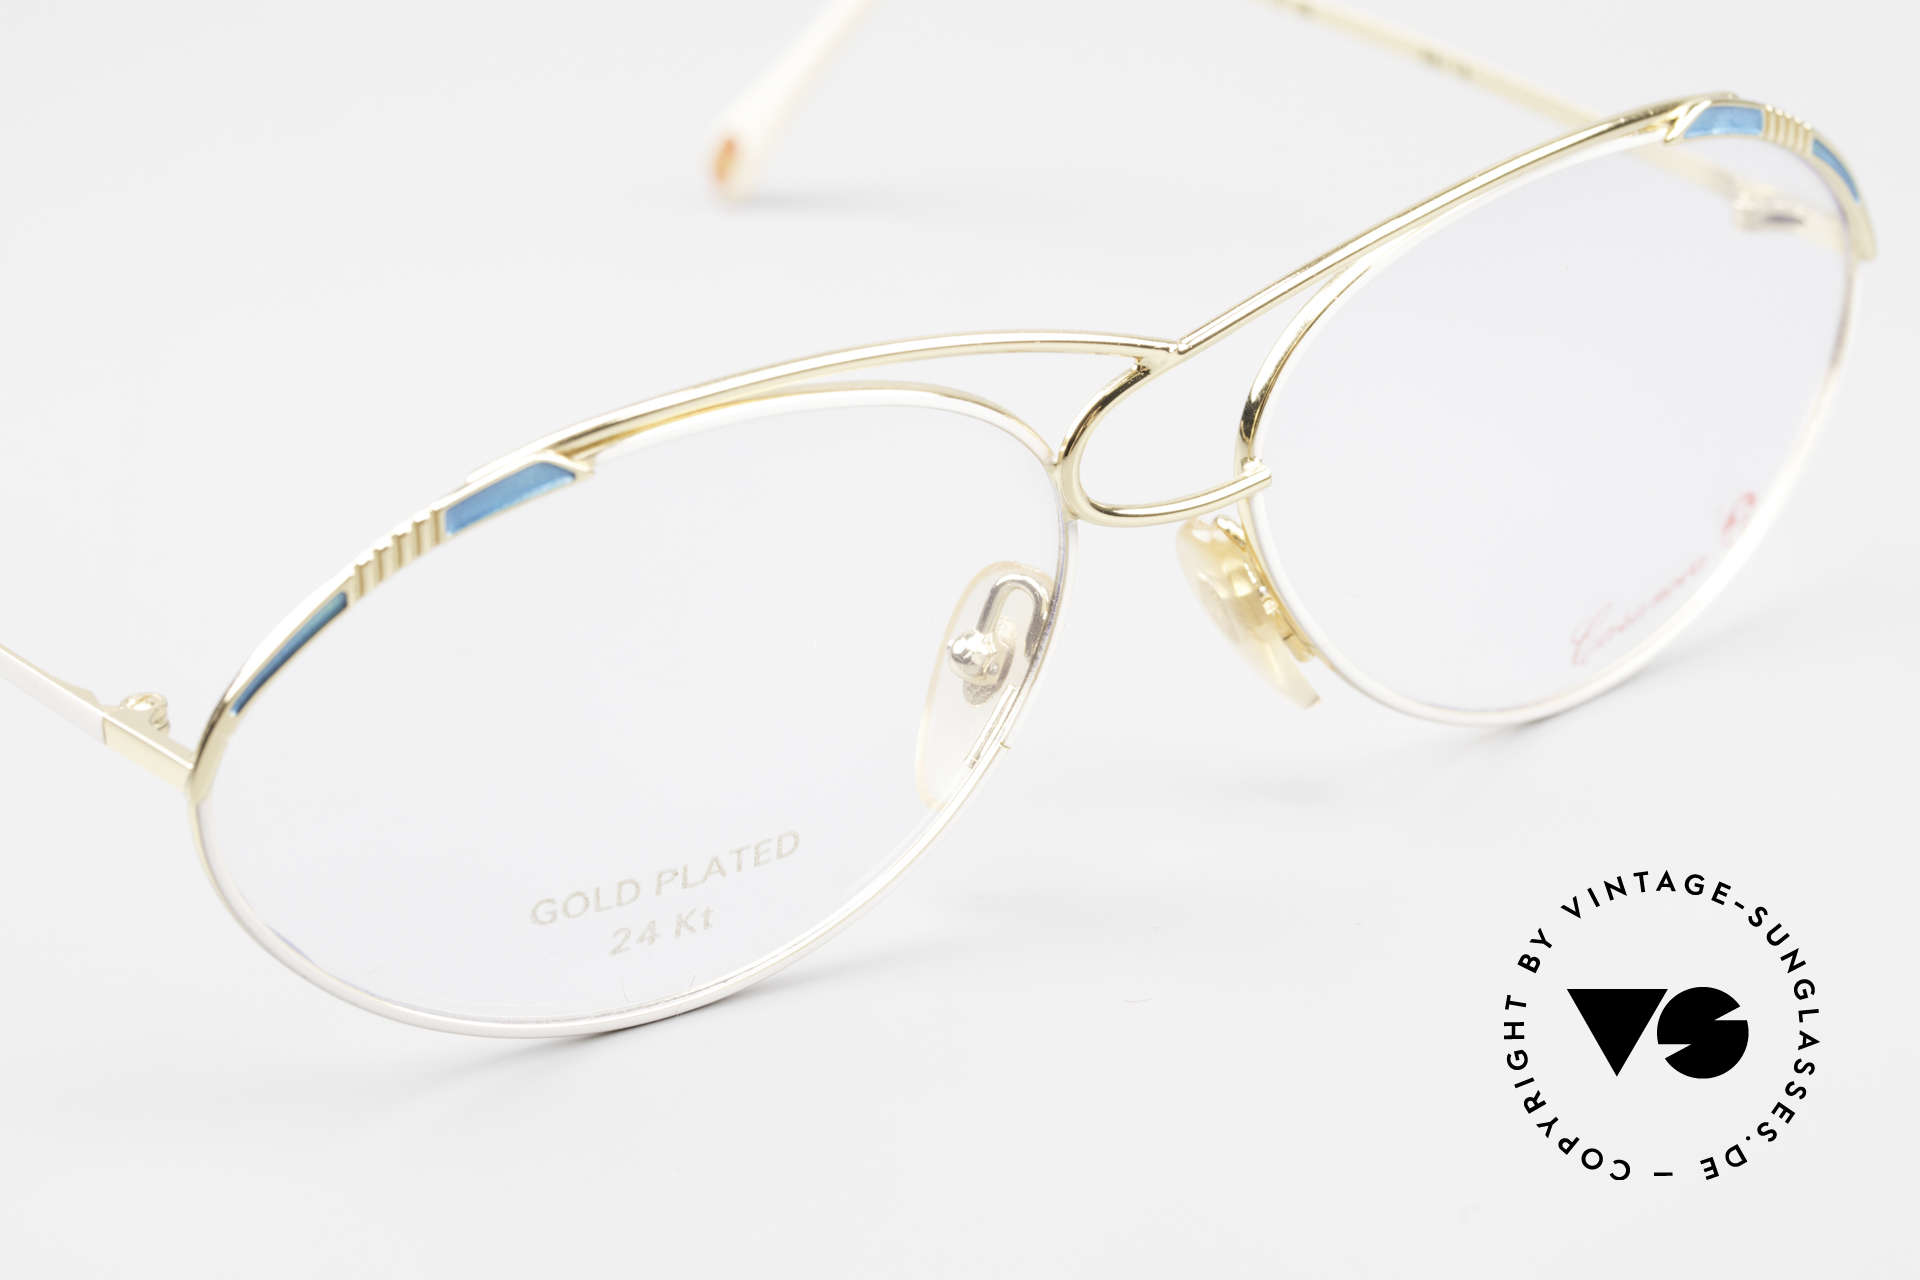 Casanova LC13 24kt Gold Plated Vintage Frame, NOS - unworn (like all our artistic vintage 80's eyewear), Made for Women